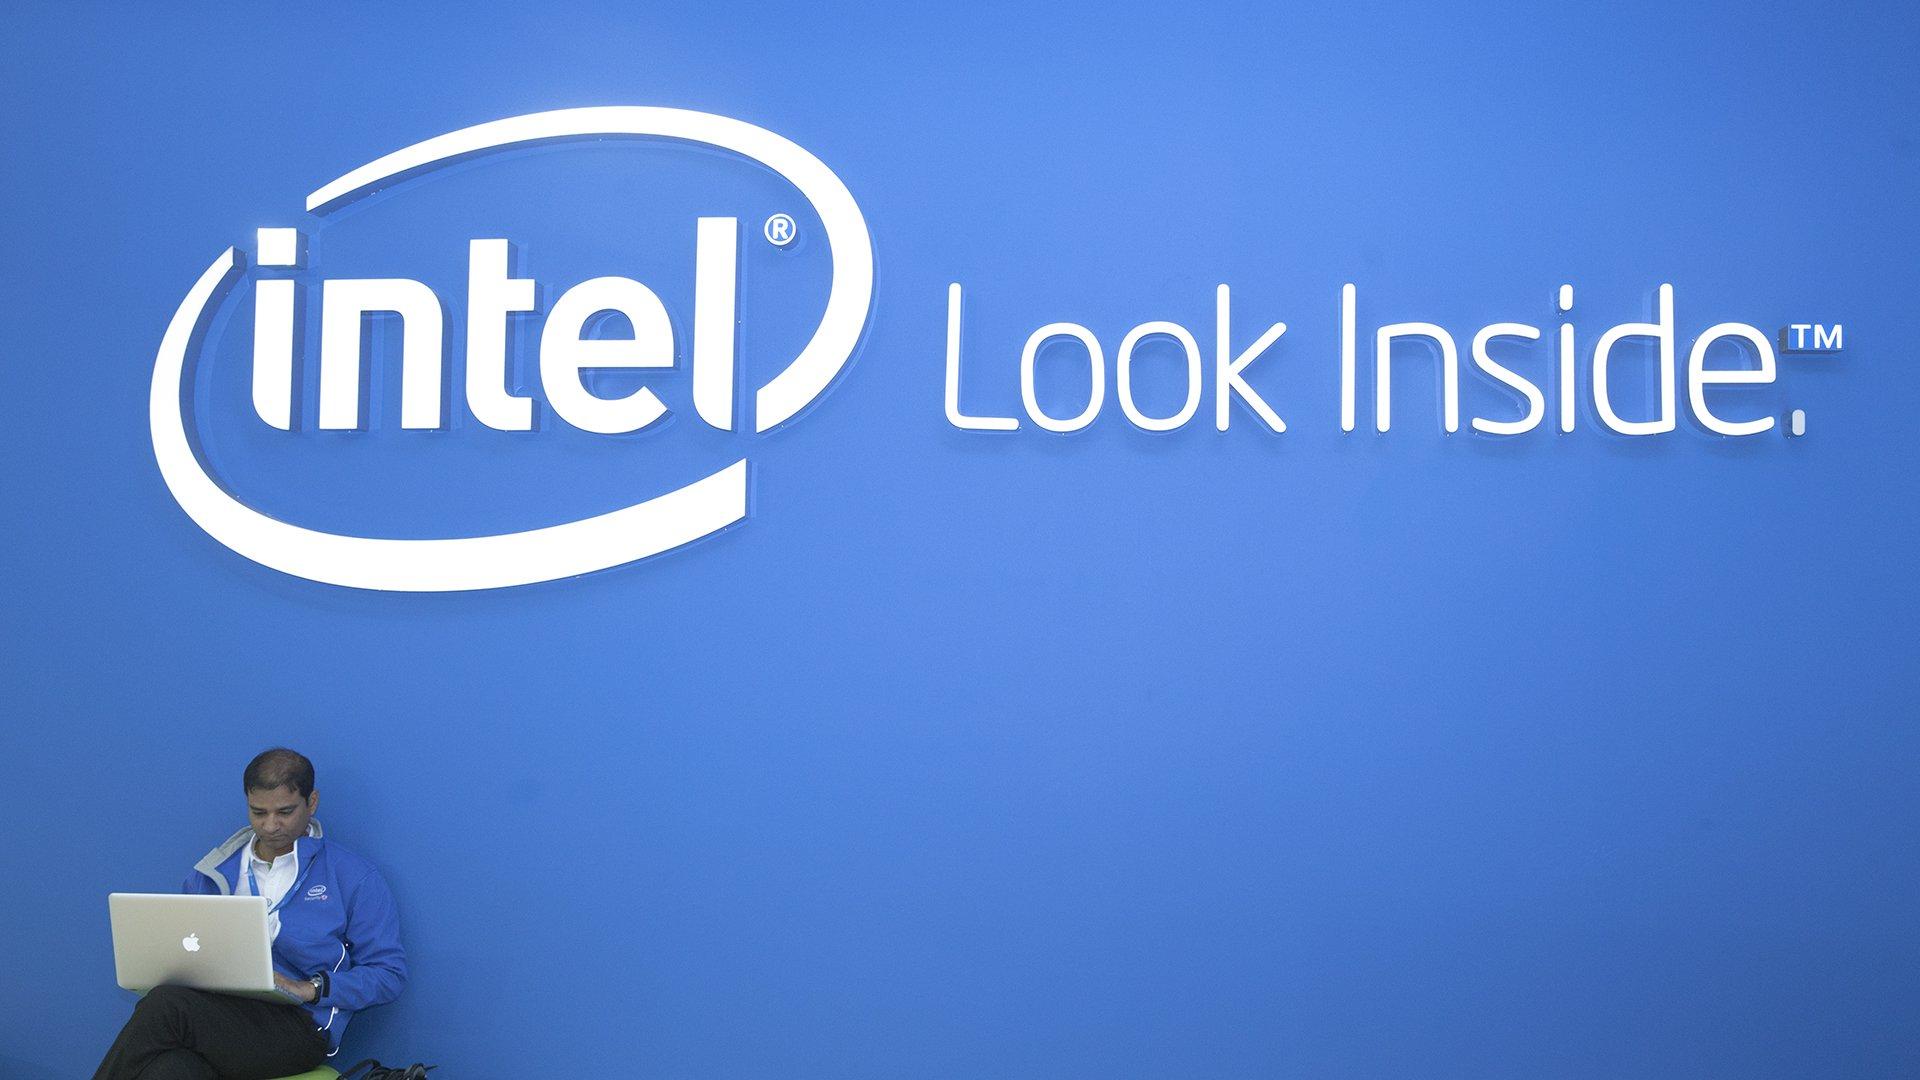 Core i7-7740K 與 Core i5-7640K 搭配 X299 晶片,Intel Kaby Lake-X 處理器規格明顯殘缺